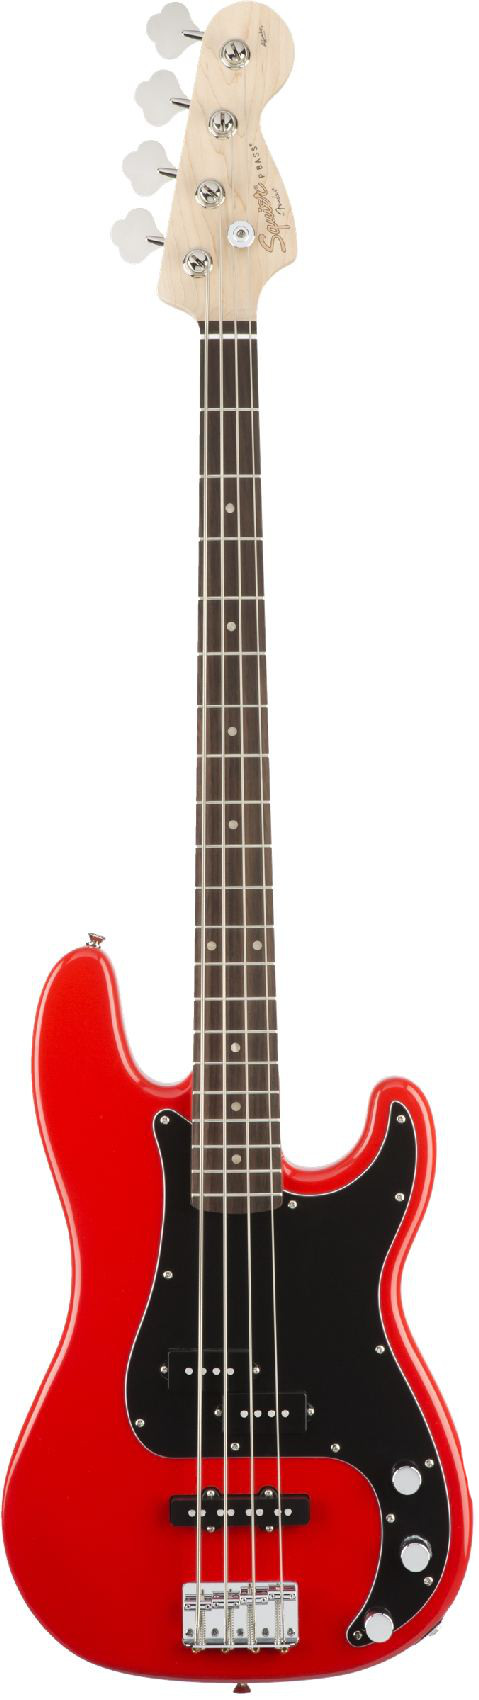 Бас-гитара Fender Squier Affinity PJ Bass BWB PG RCR